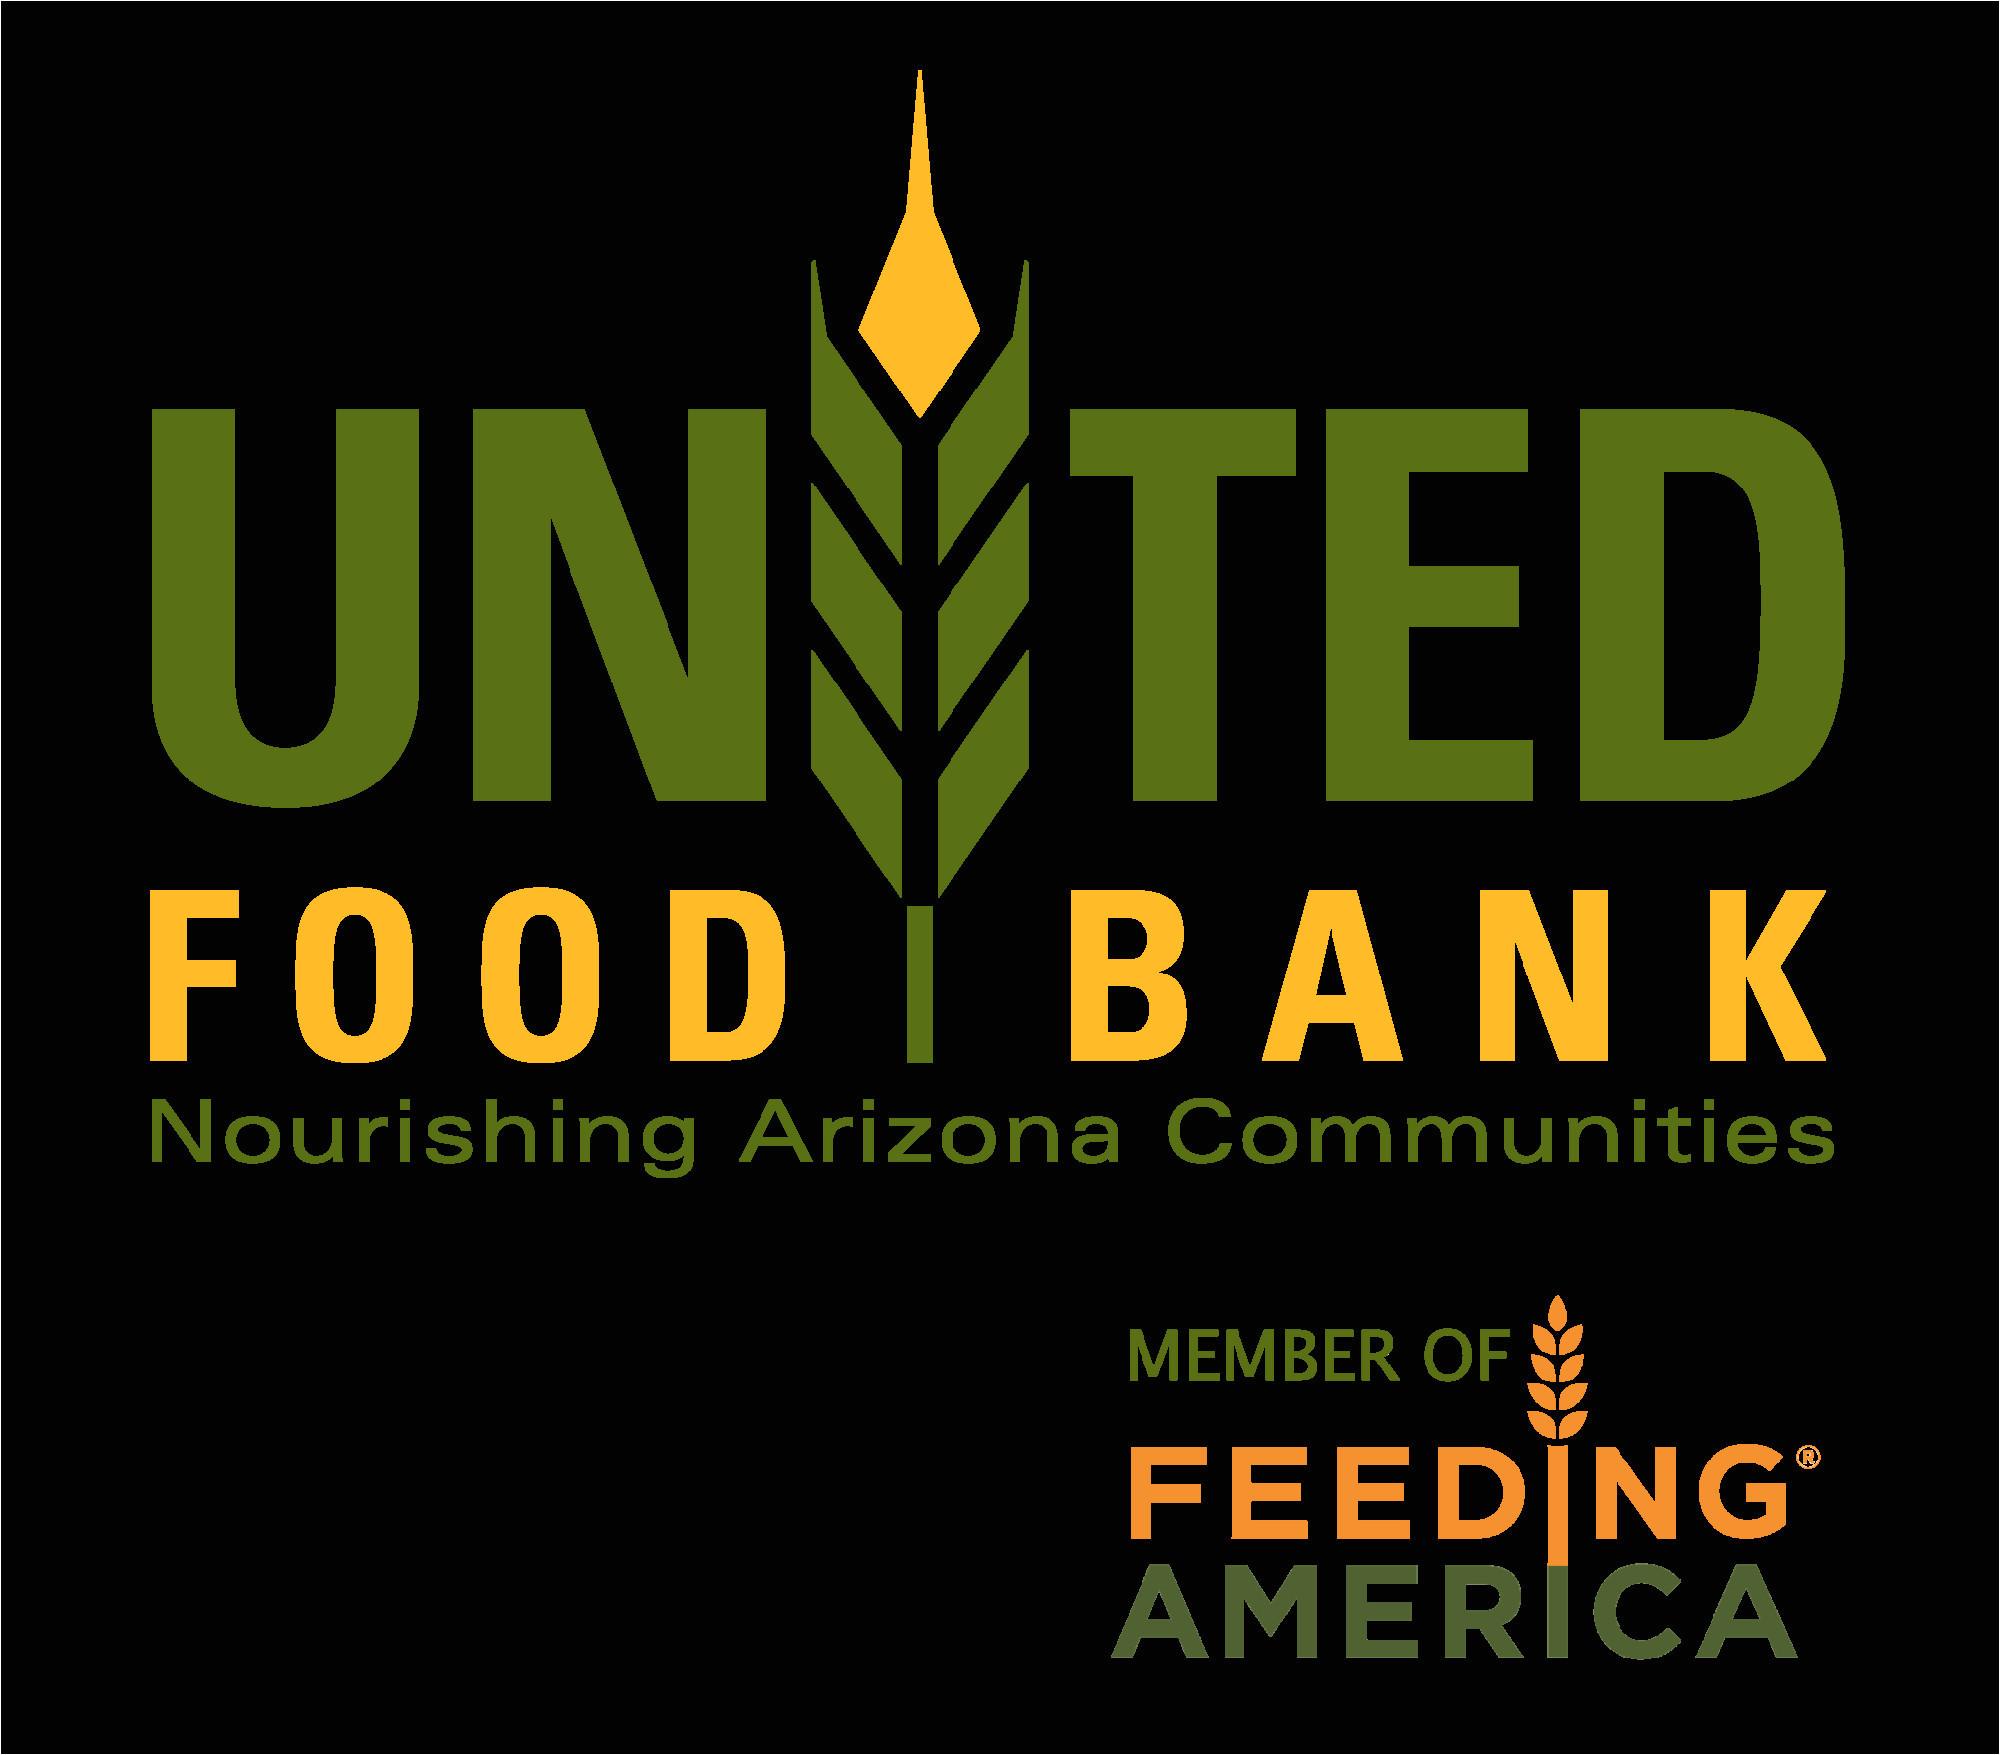 Best butcher Shop In Mesa Az butcher Shop Near Mesa Az United Food Bank Nourishing Arizona